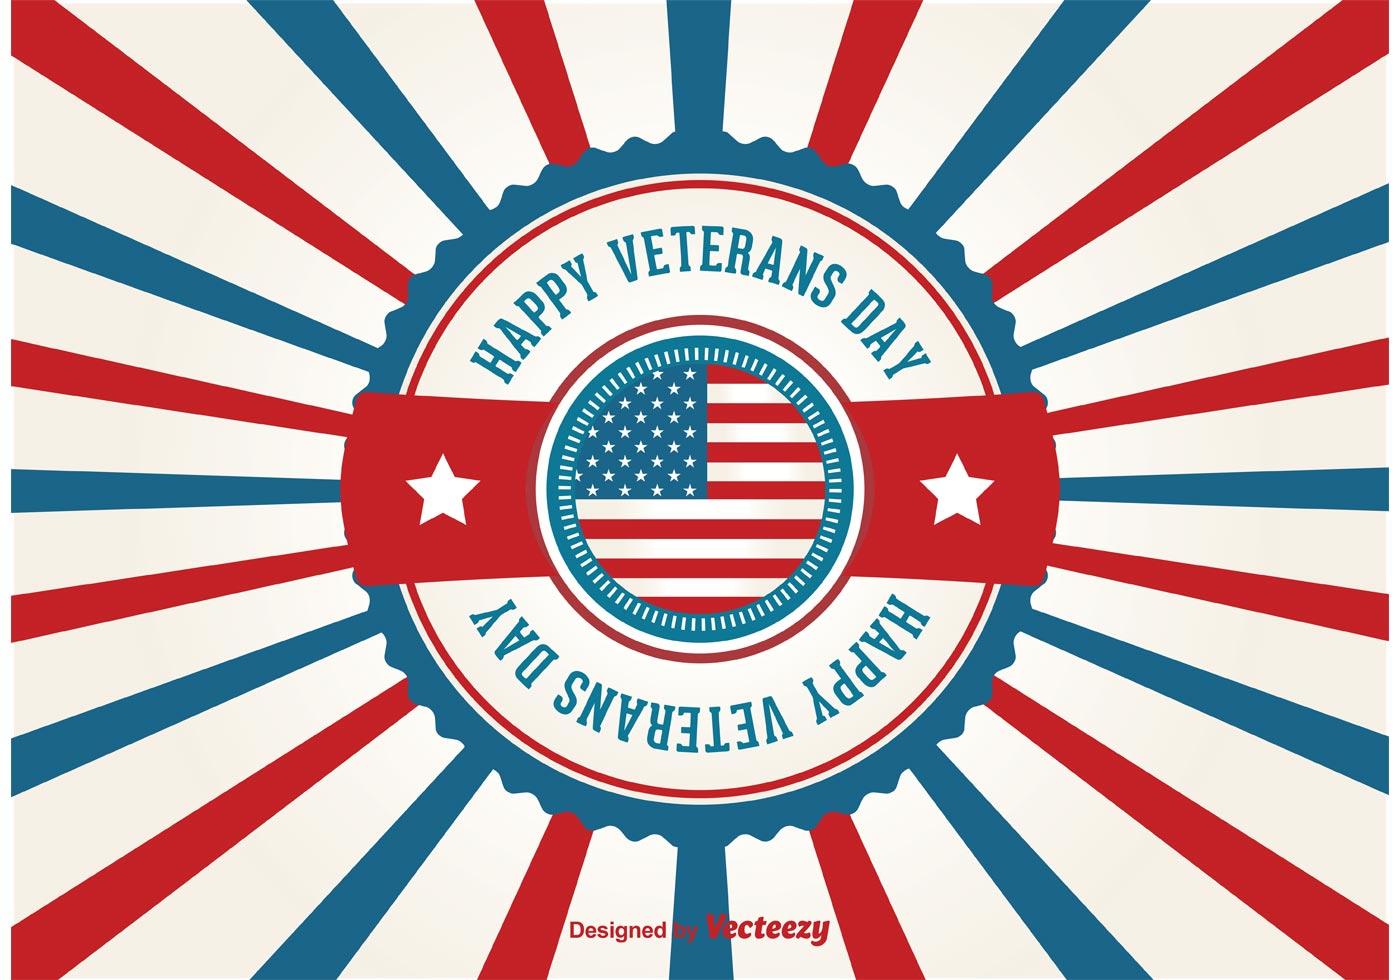 1400x980 Veterans Day Retro Poster